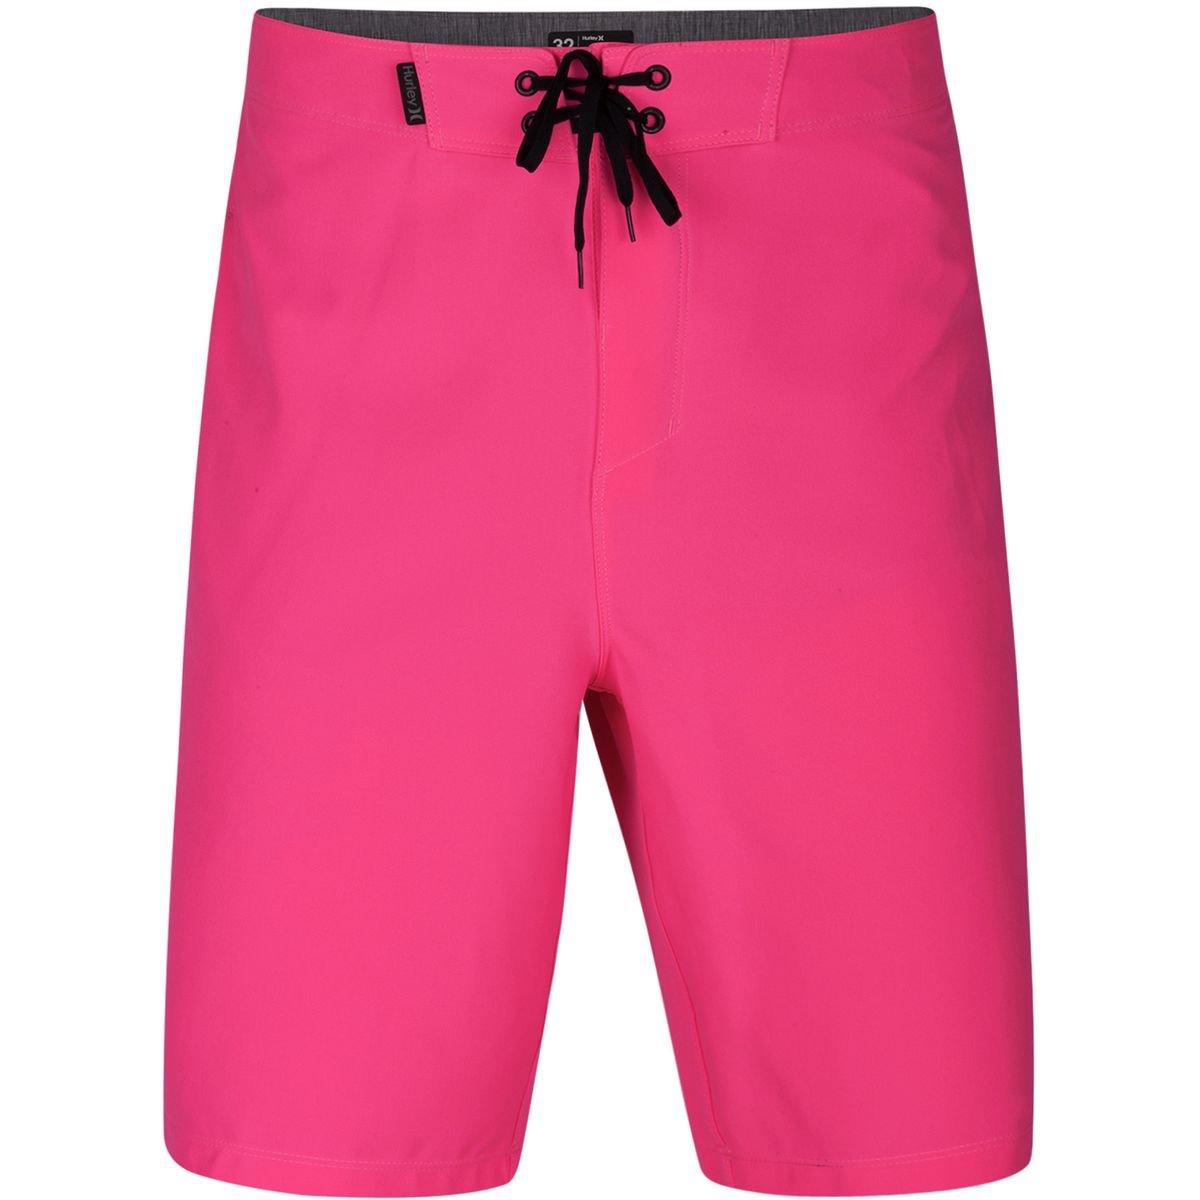 Hurley Men's Phantom P30 One & Only Stretch 20'' Boardshort Swim Short, Hyper Pink, 28